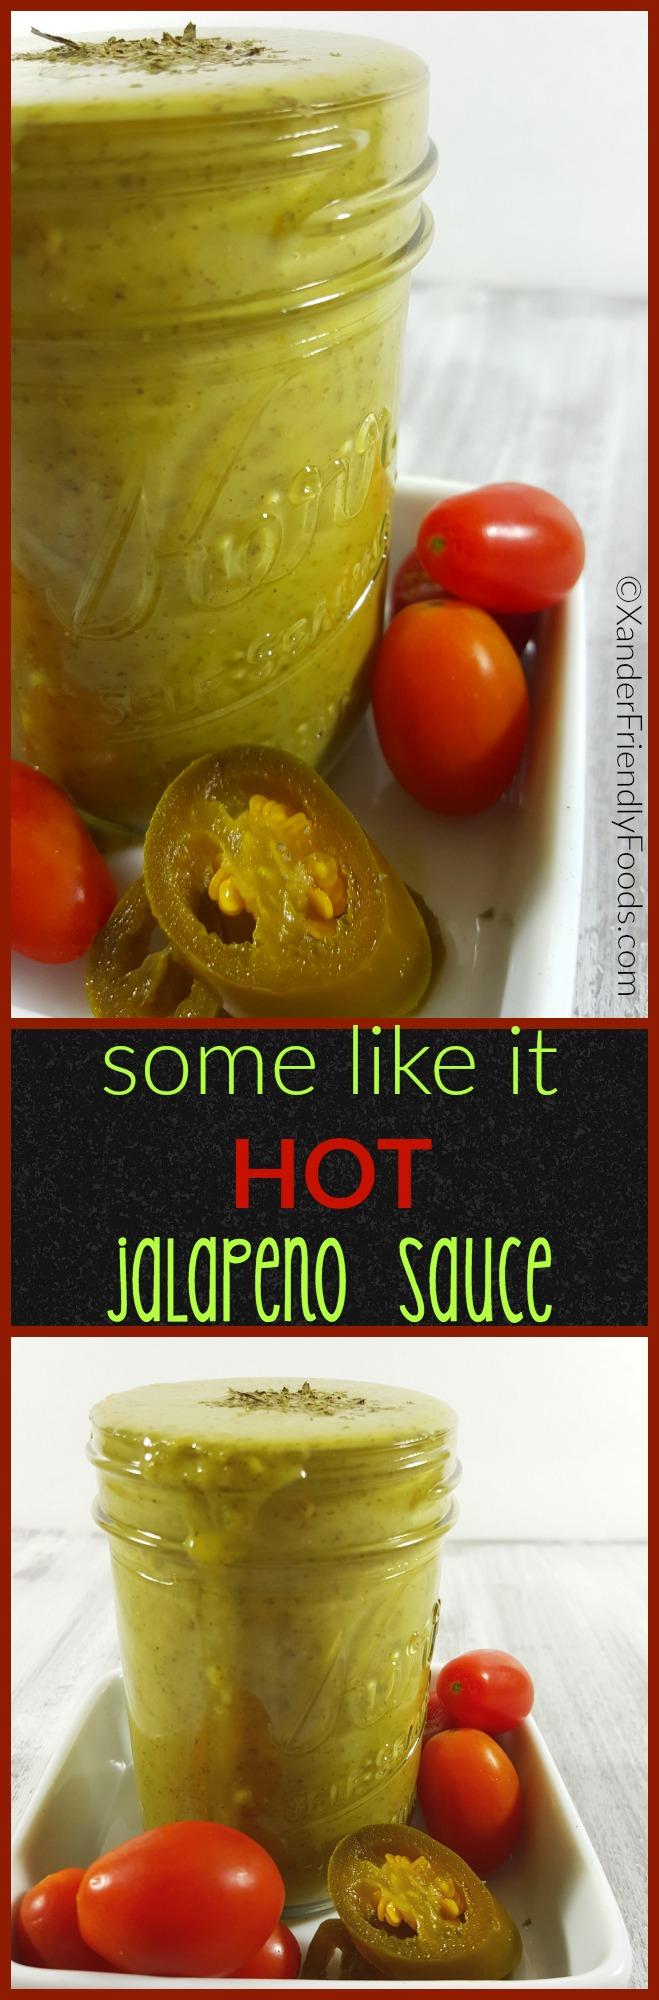 Quick-n-easy Jalapeno Sauce